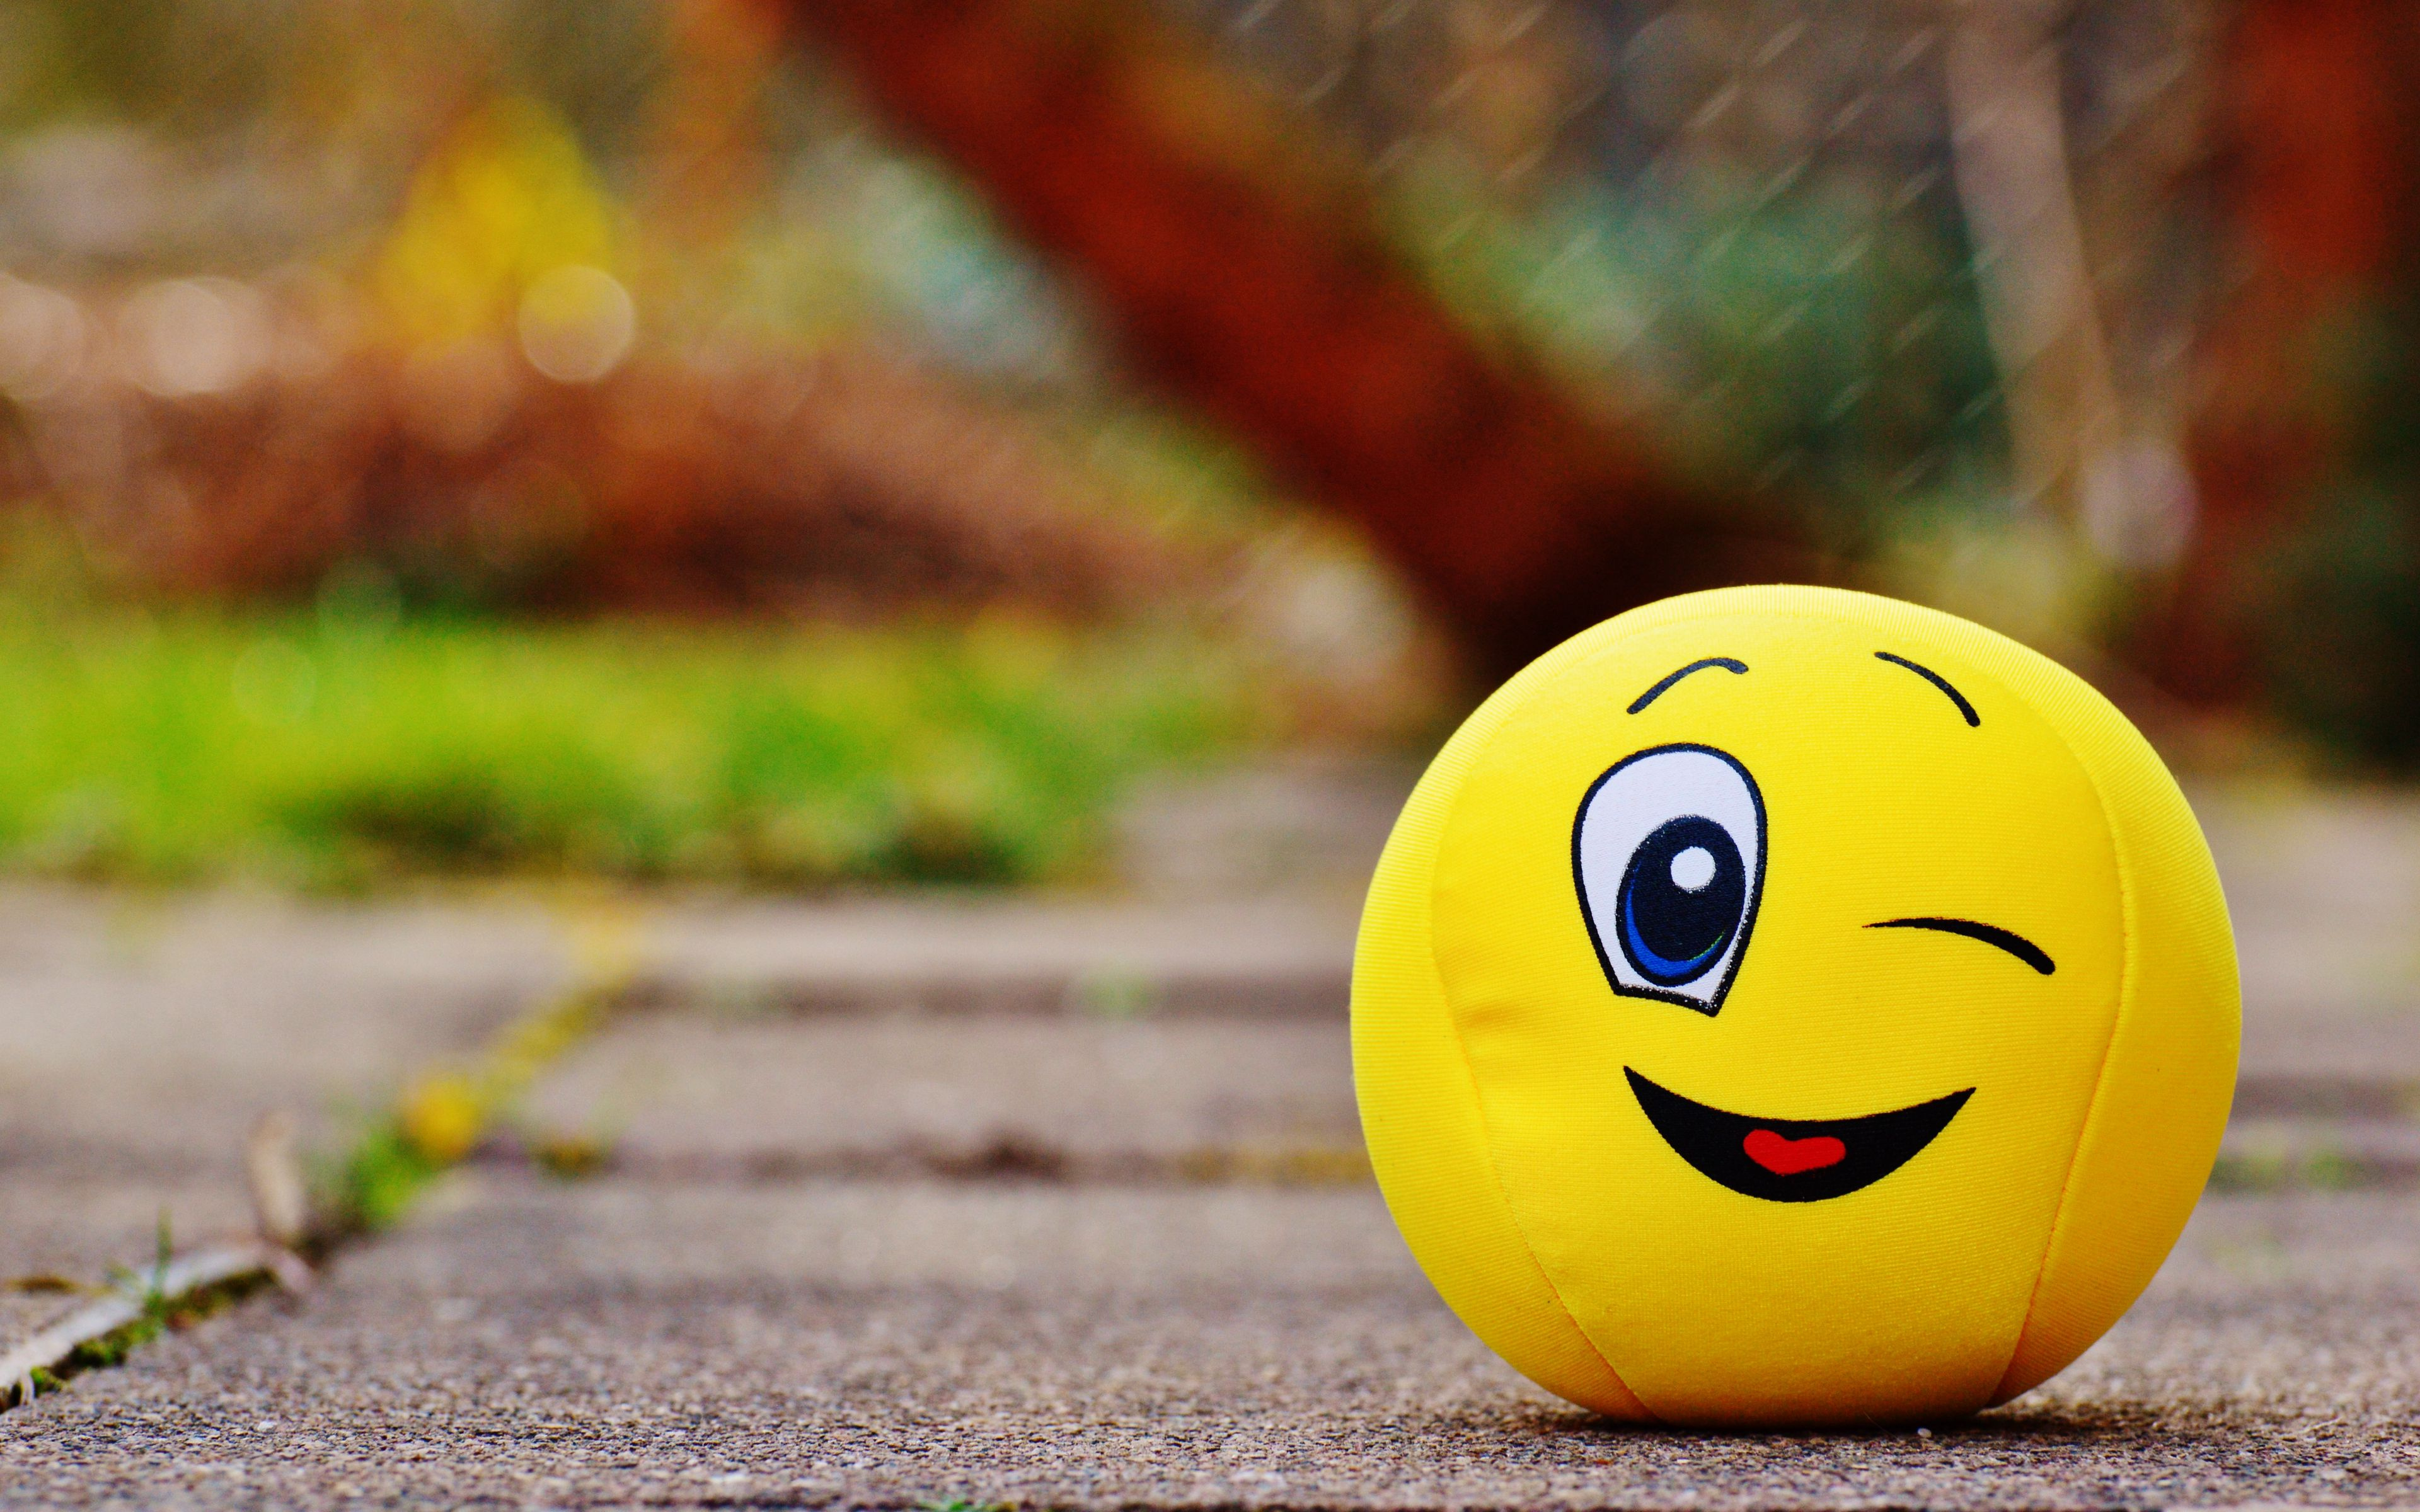 3840x2400 Wallpaper ball, smile, happy, toy